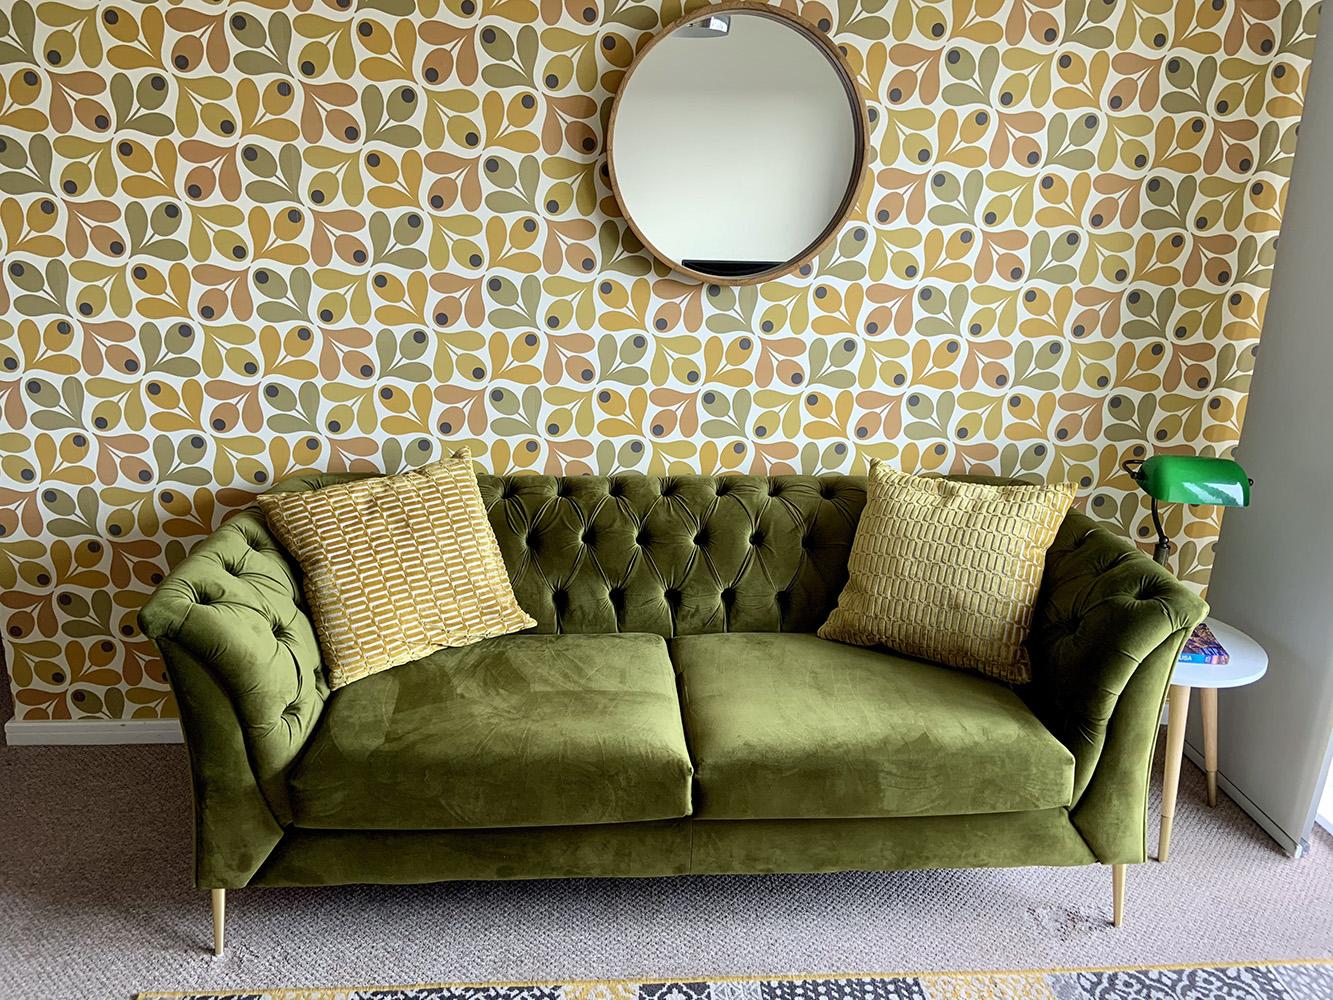 Zielona sofa Chesterfield Modern od Colina